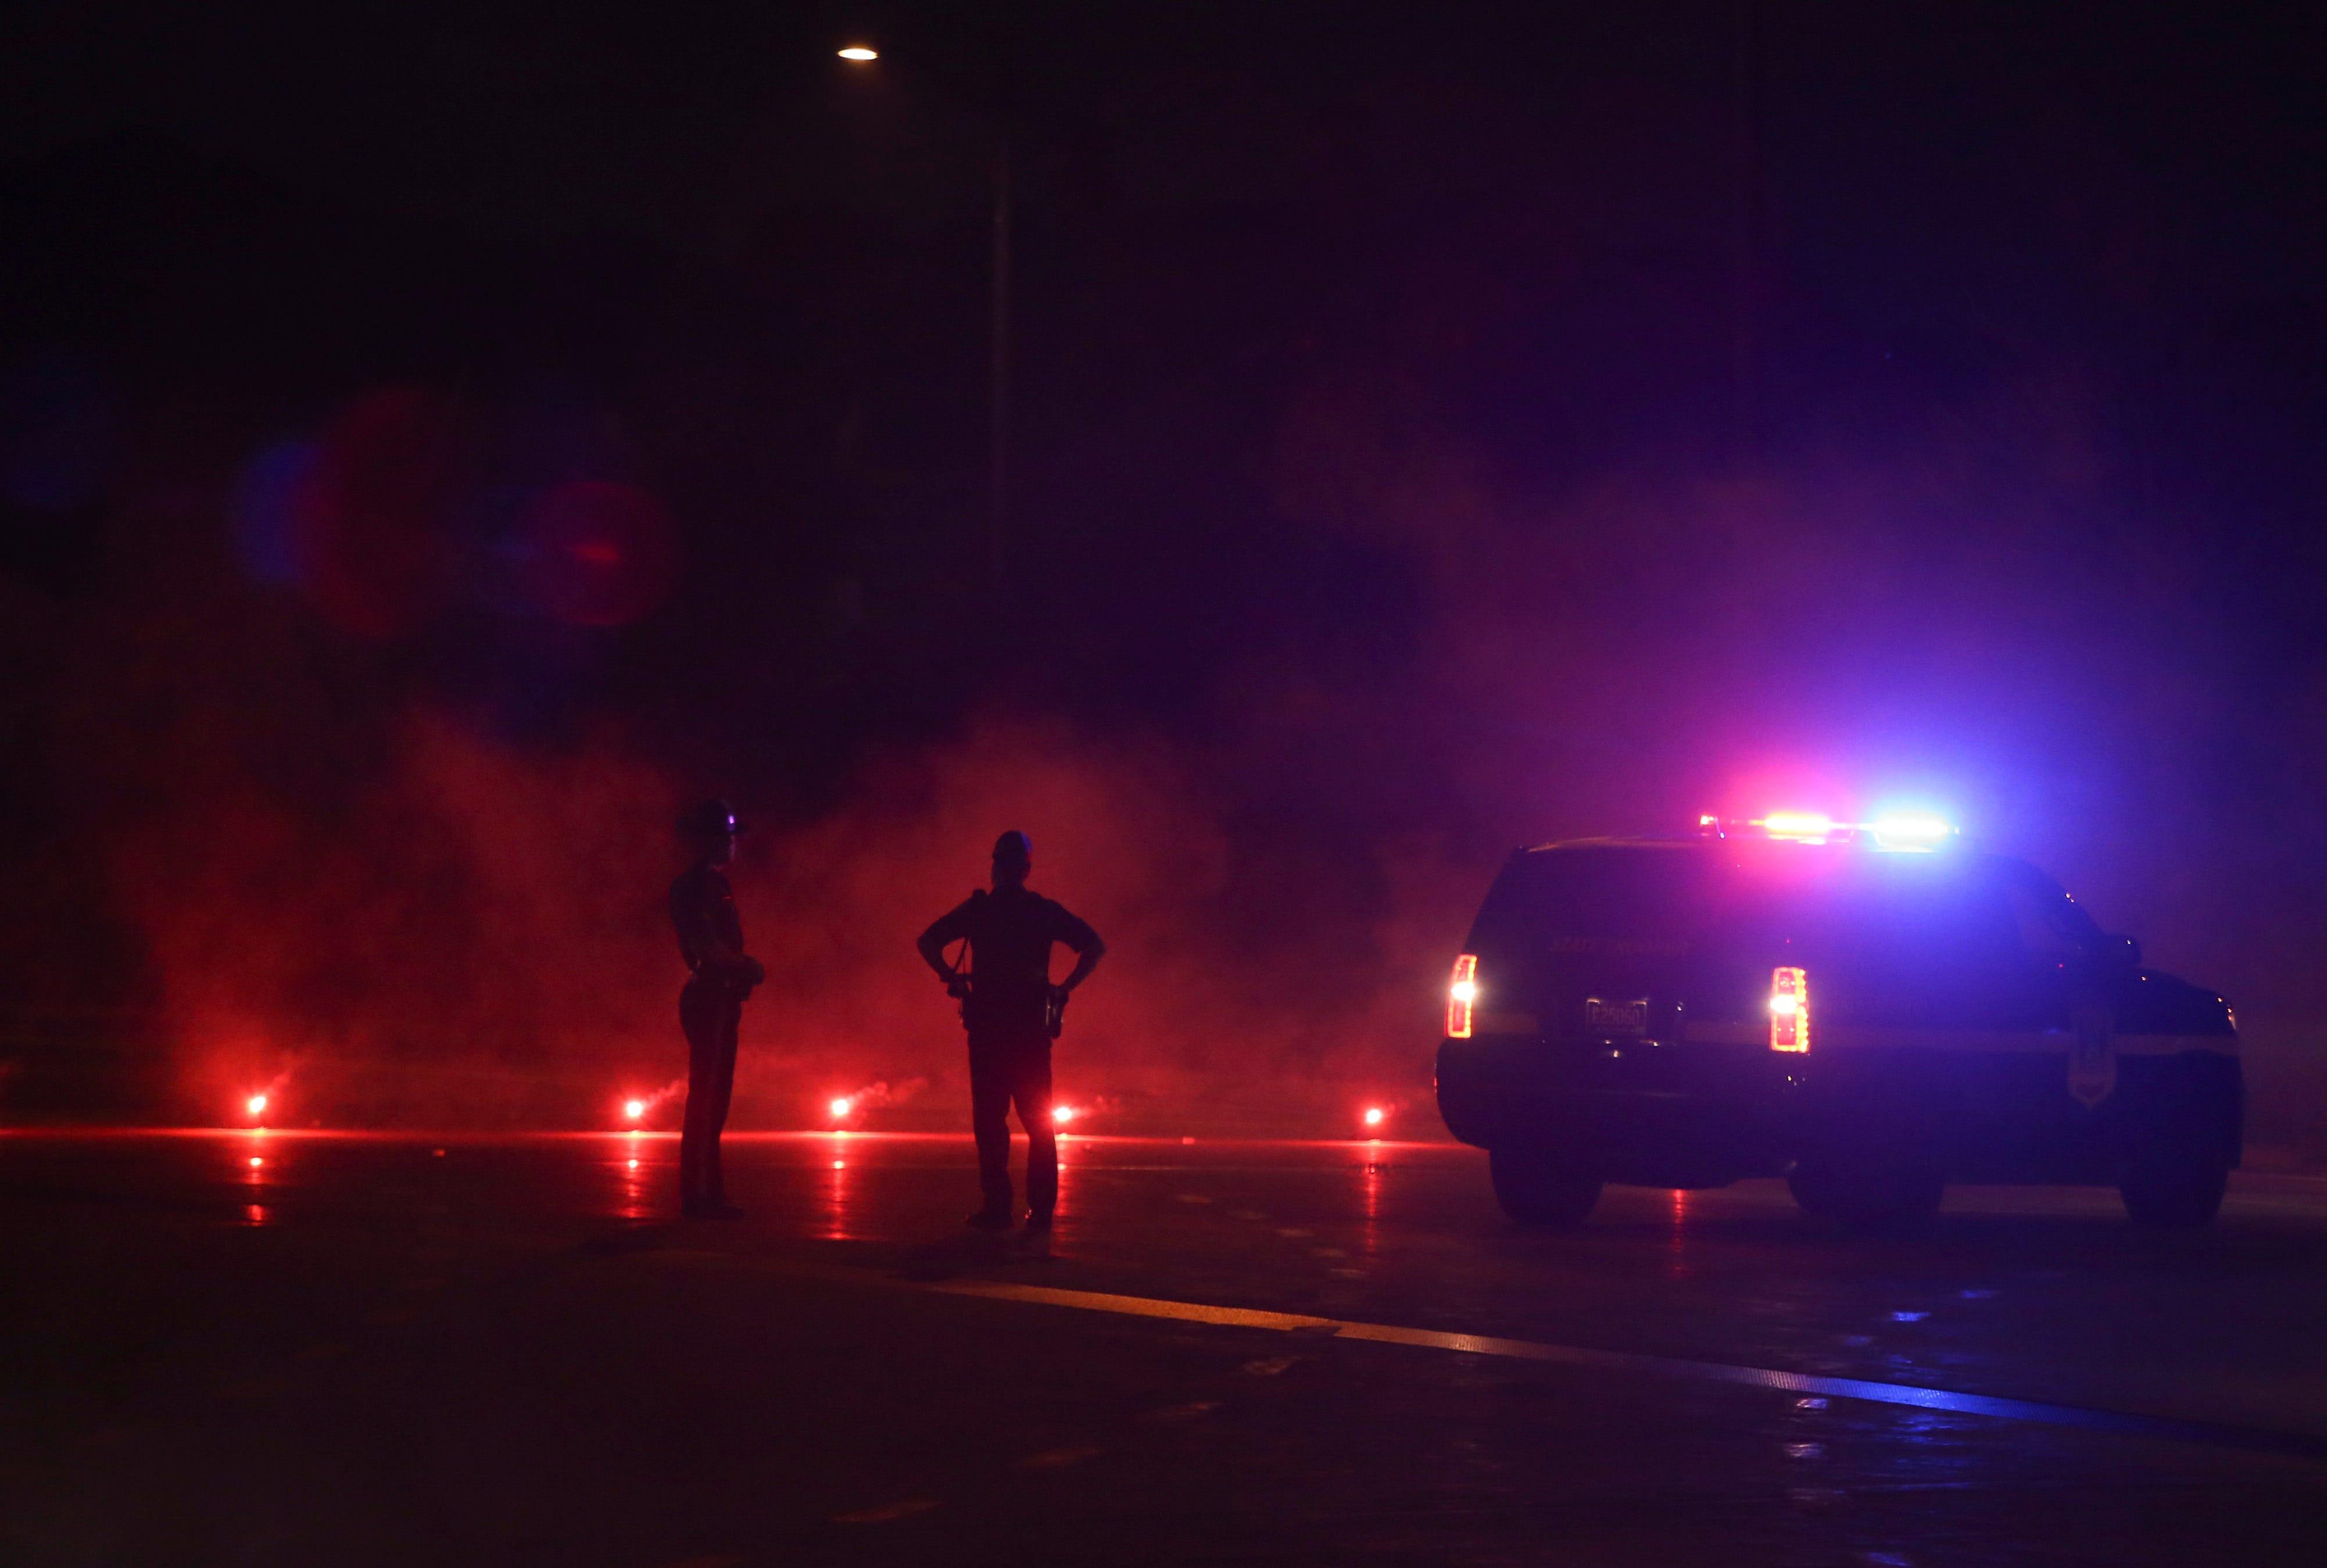 5-vehicle crash slows traffic on southbound 15 Freeway near Cajon Pass